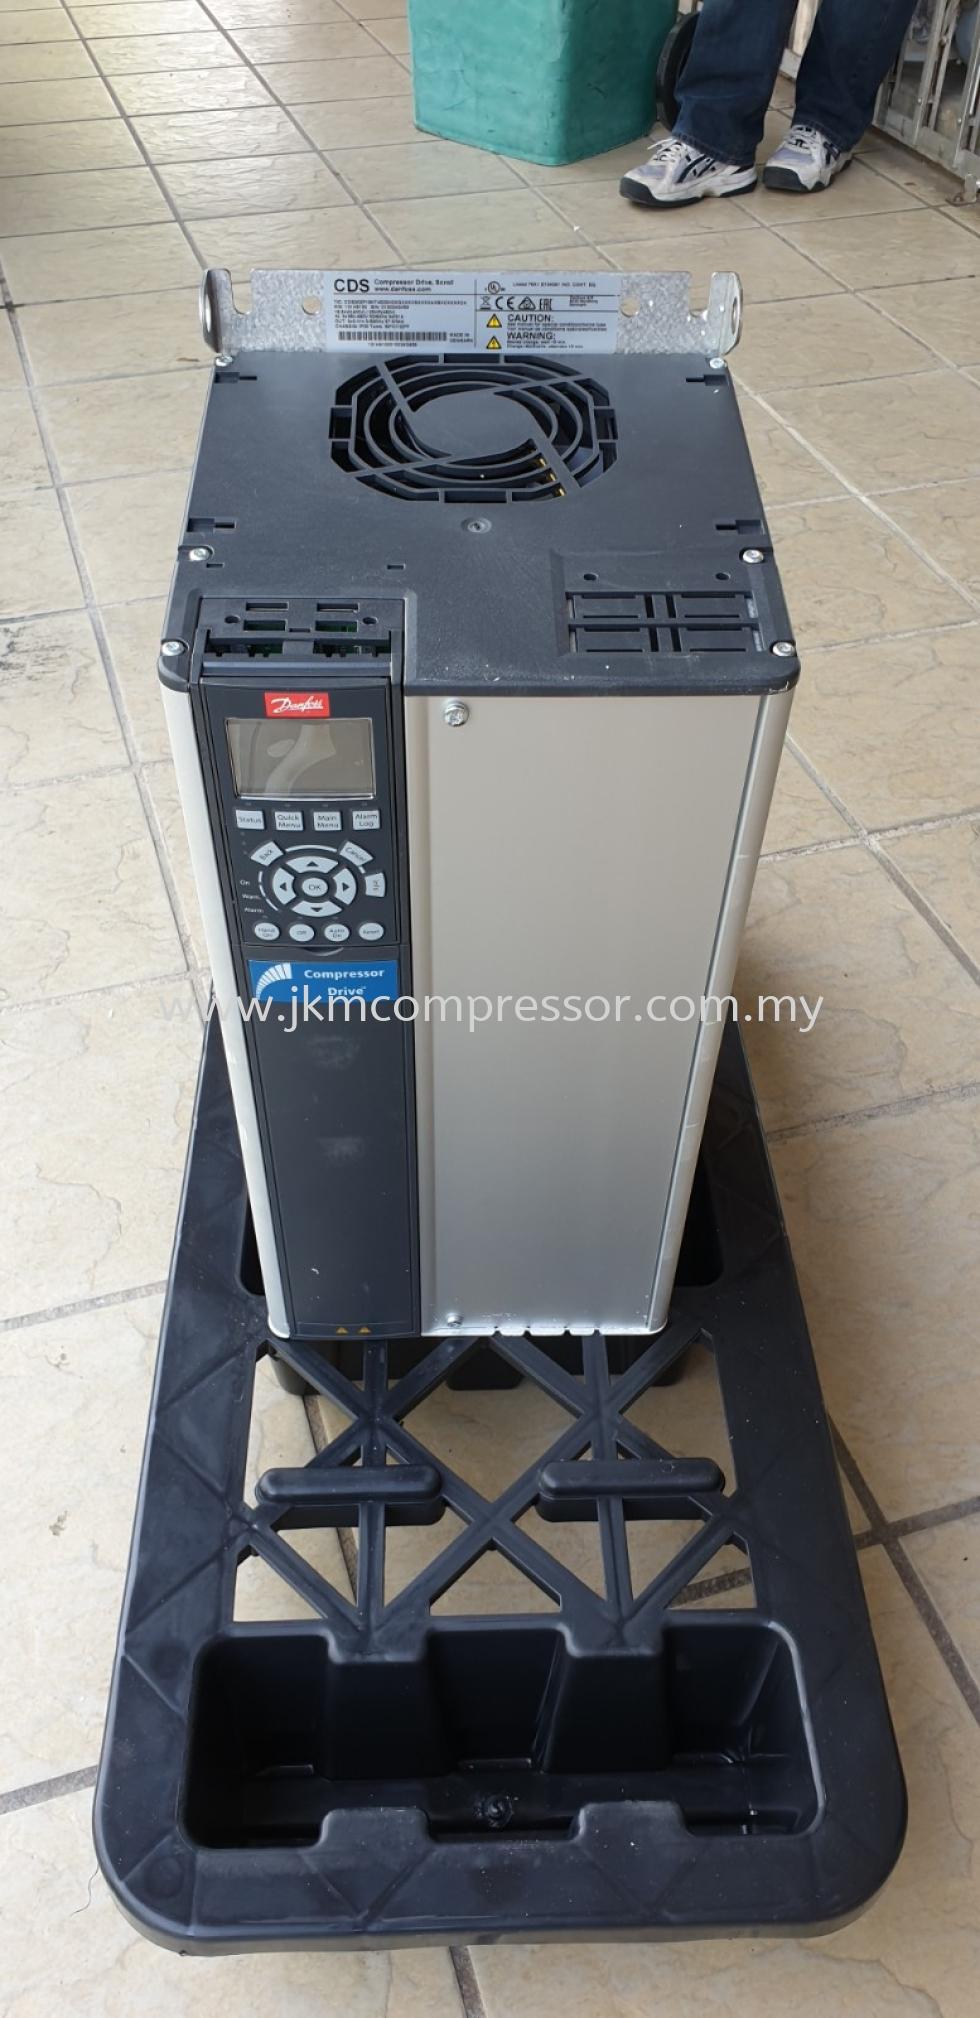 131H9100 - DANFOSS CDS302 AC INVERTER DRIVES ; 18.5kW ; VSD VARIABLE SPEED DRIVES